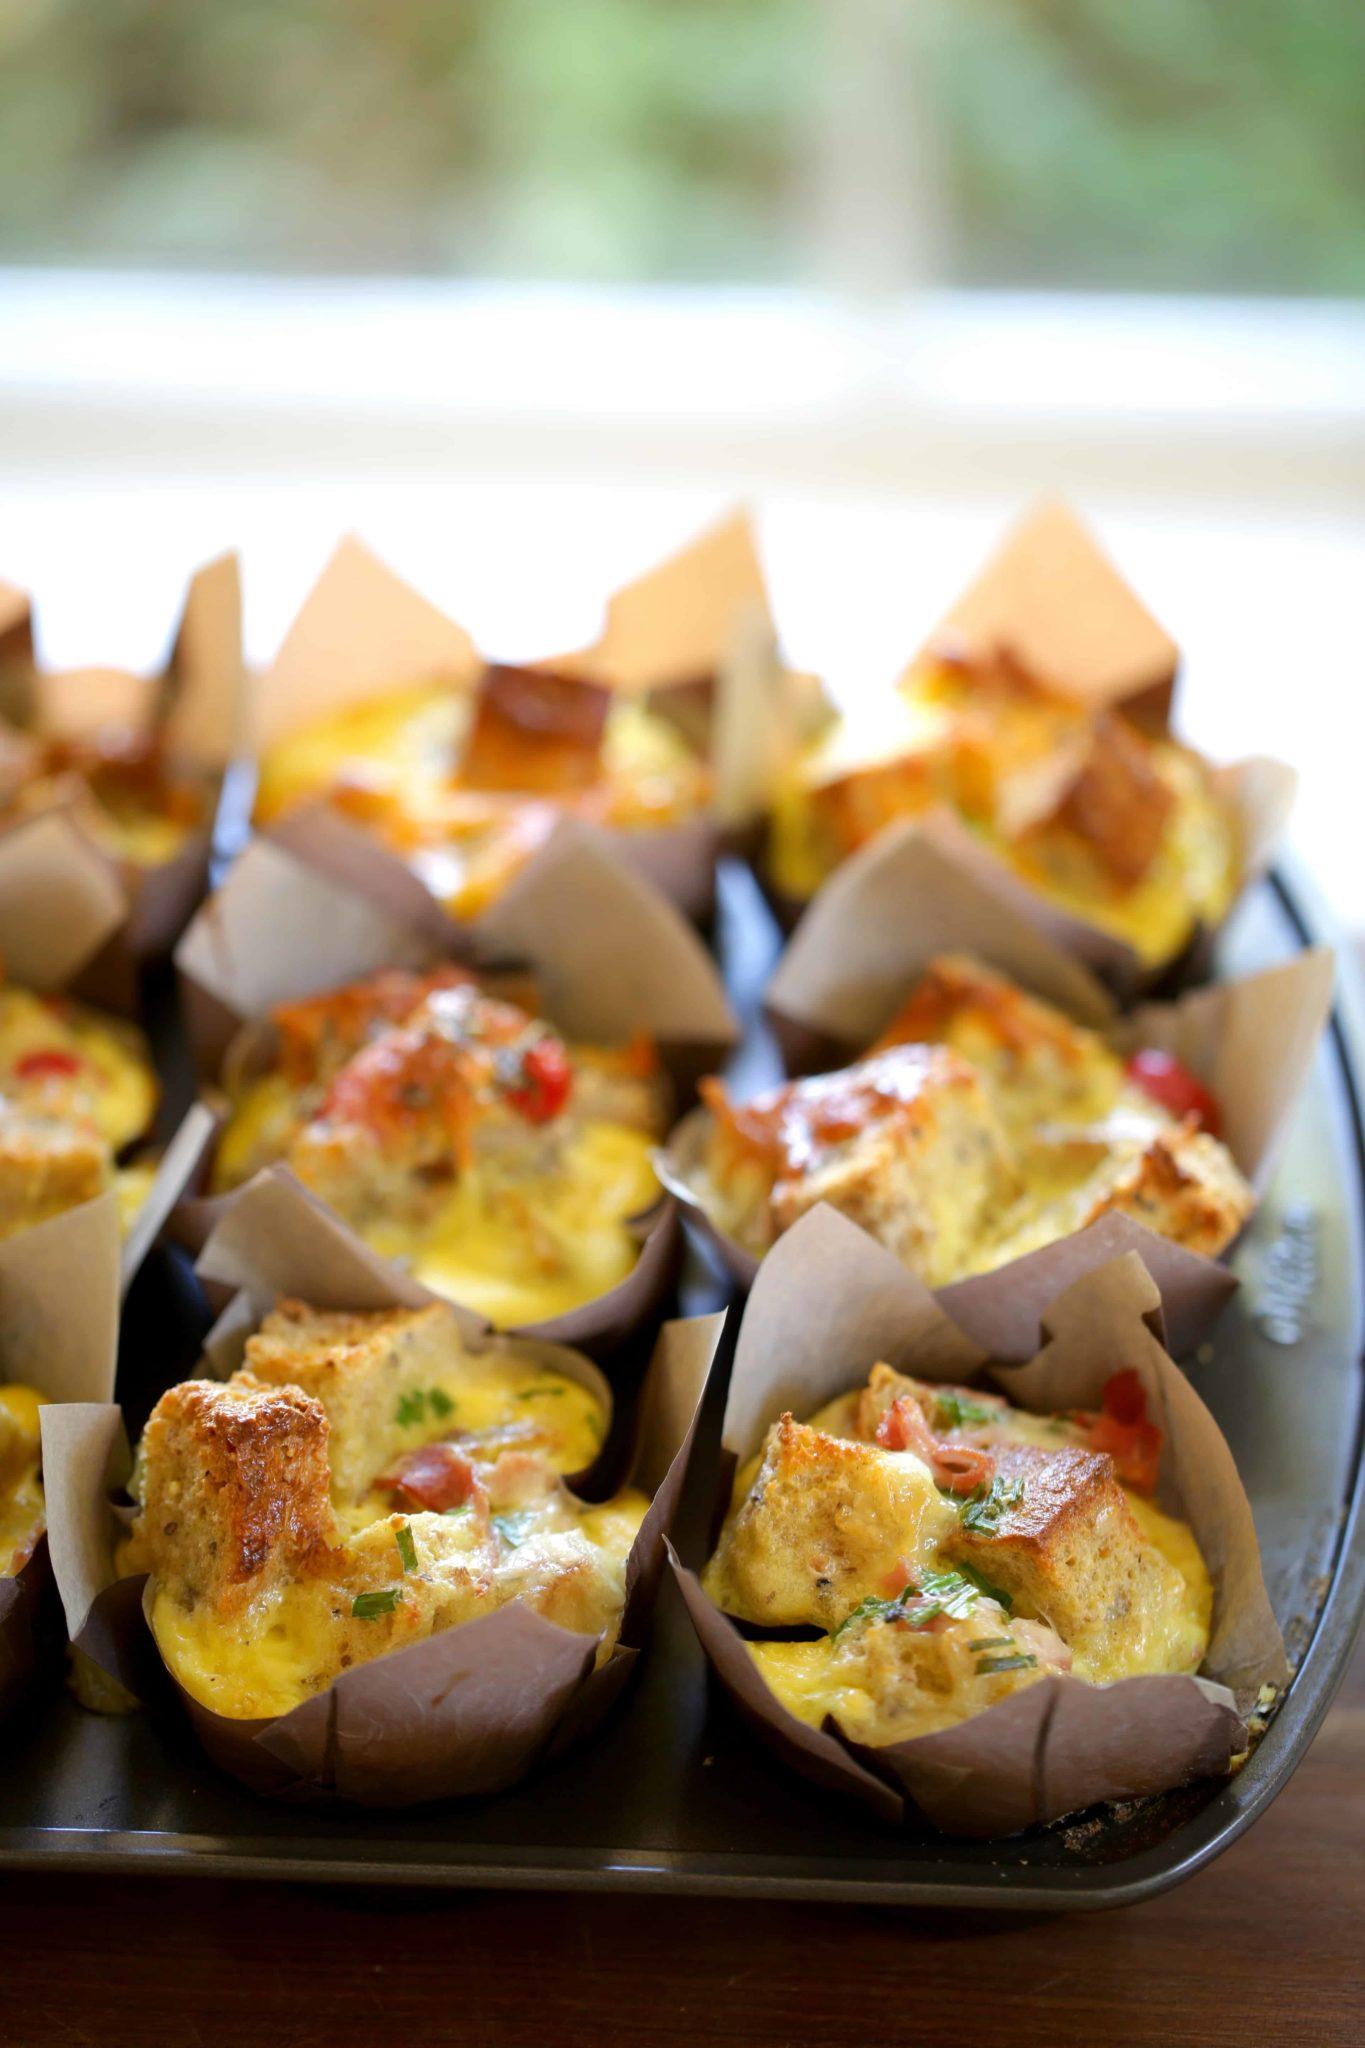 3 Mini Egg Stratas in a Muffin Tin